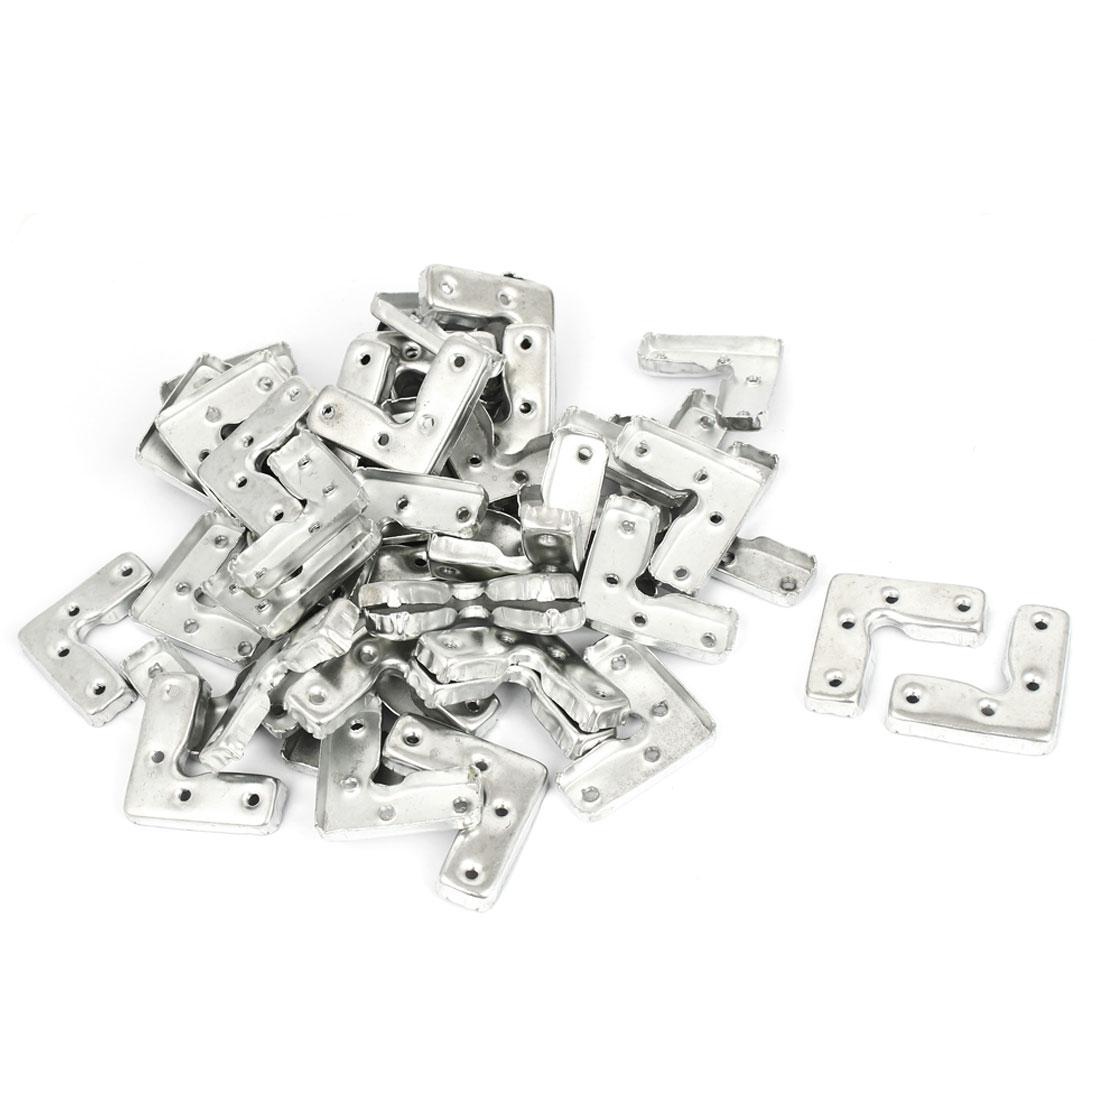 45mm x 45mm x 16mm Metal Corner Brace Joint Right Angle Bracket 50 Pcs